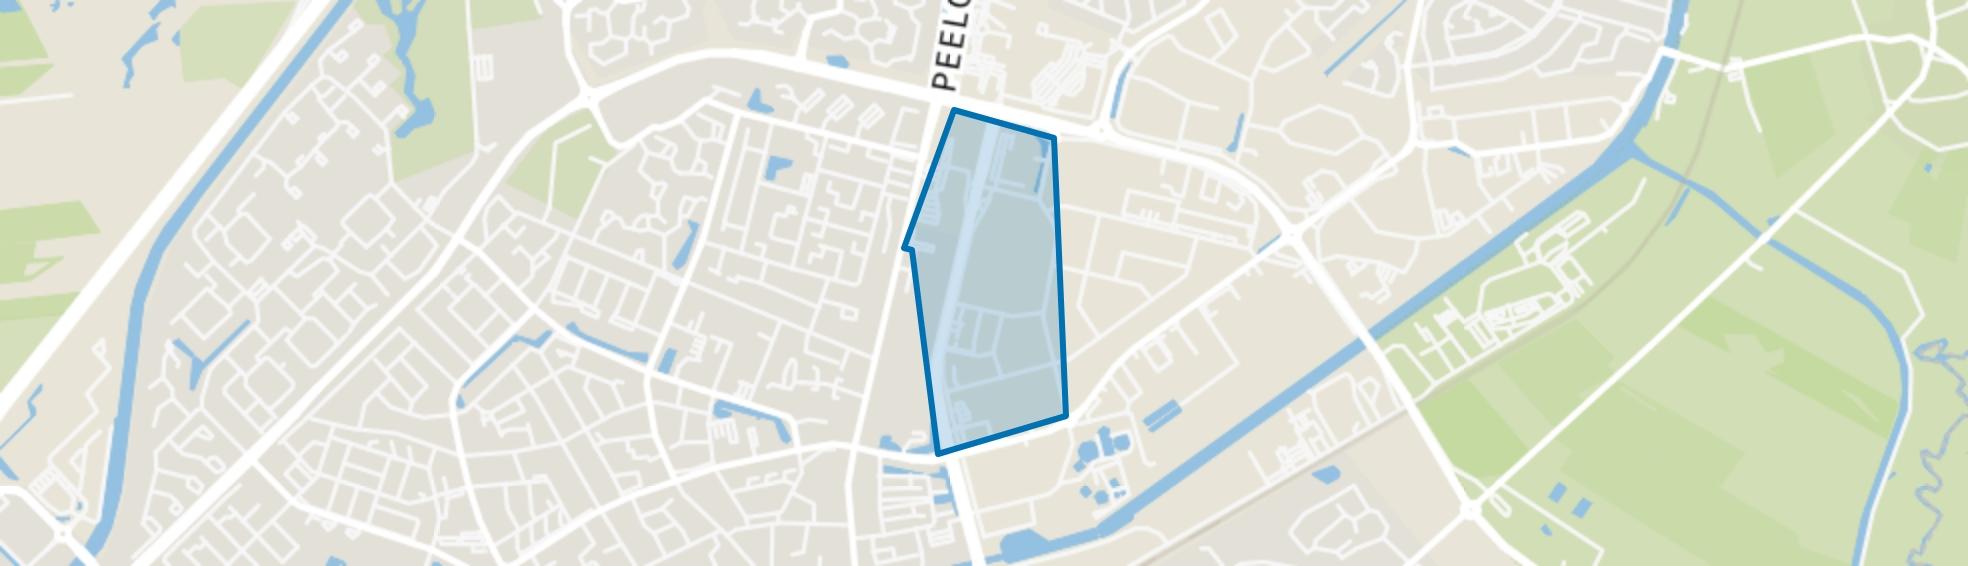 Bedrijventerrein West, Assen map